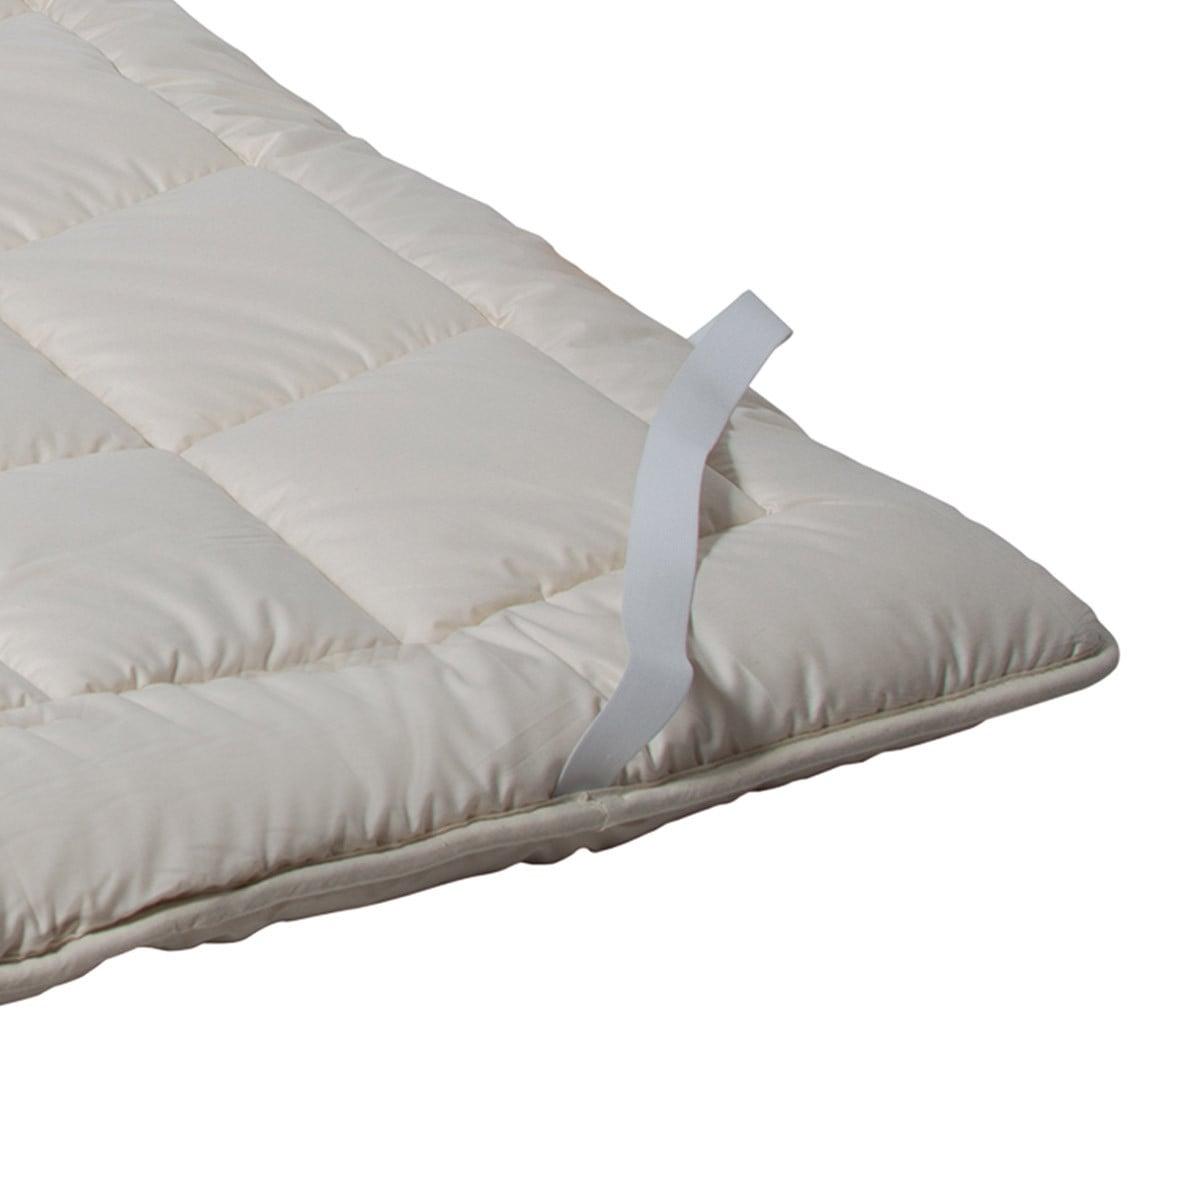 hefel unterbett protector wool g nstig online kaufen bei bettwaren shop. Black Bedroom Furniture Sets. Home Design Ideas